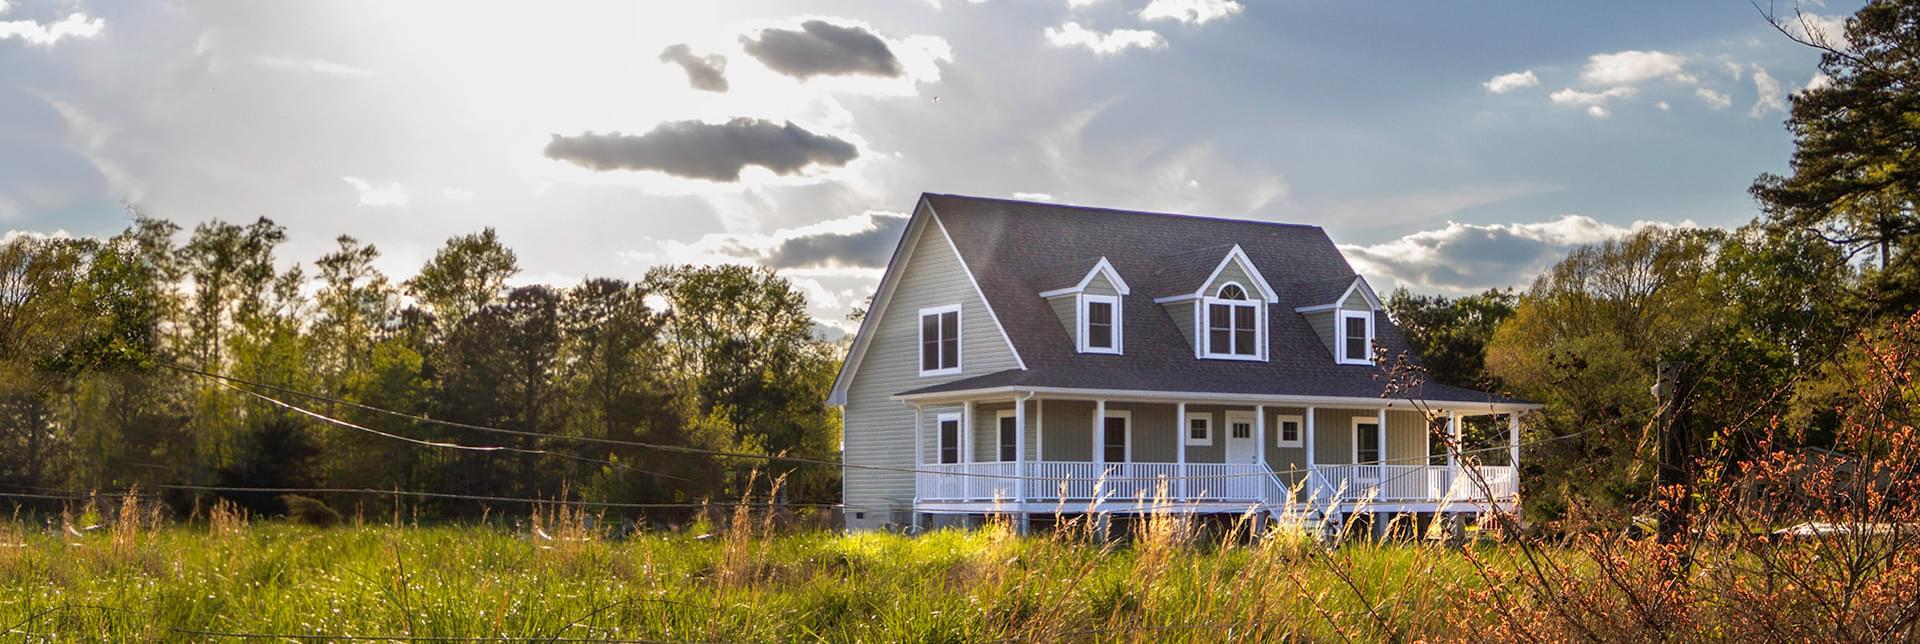 New Homes in City of Fairfax VA